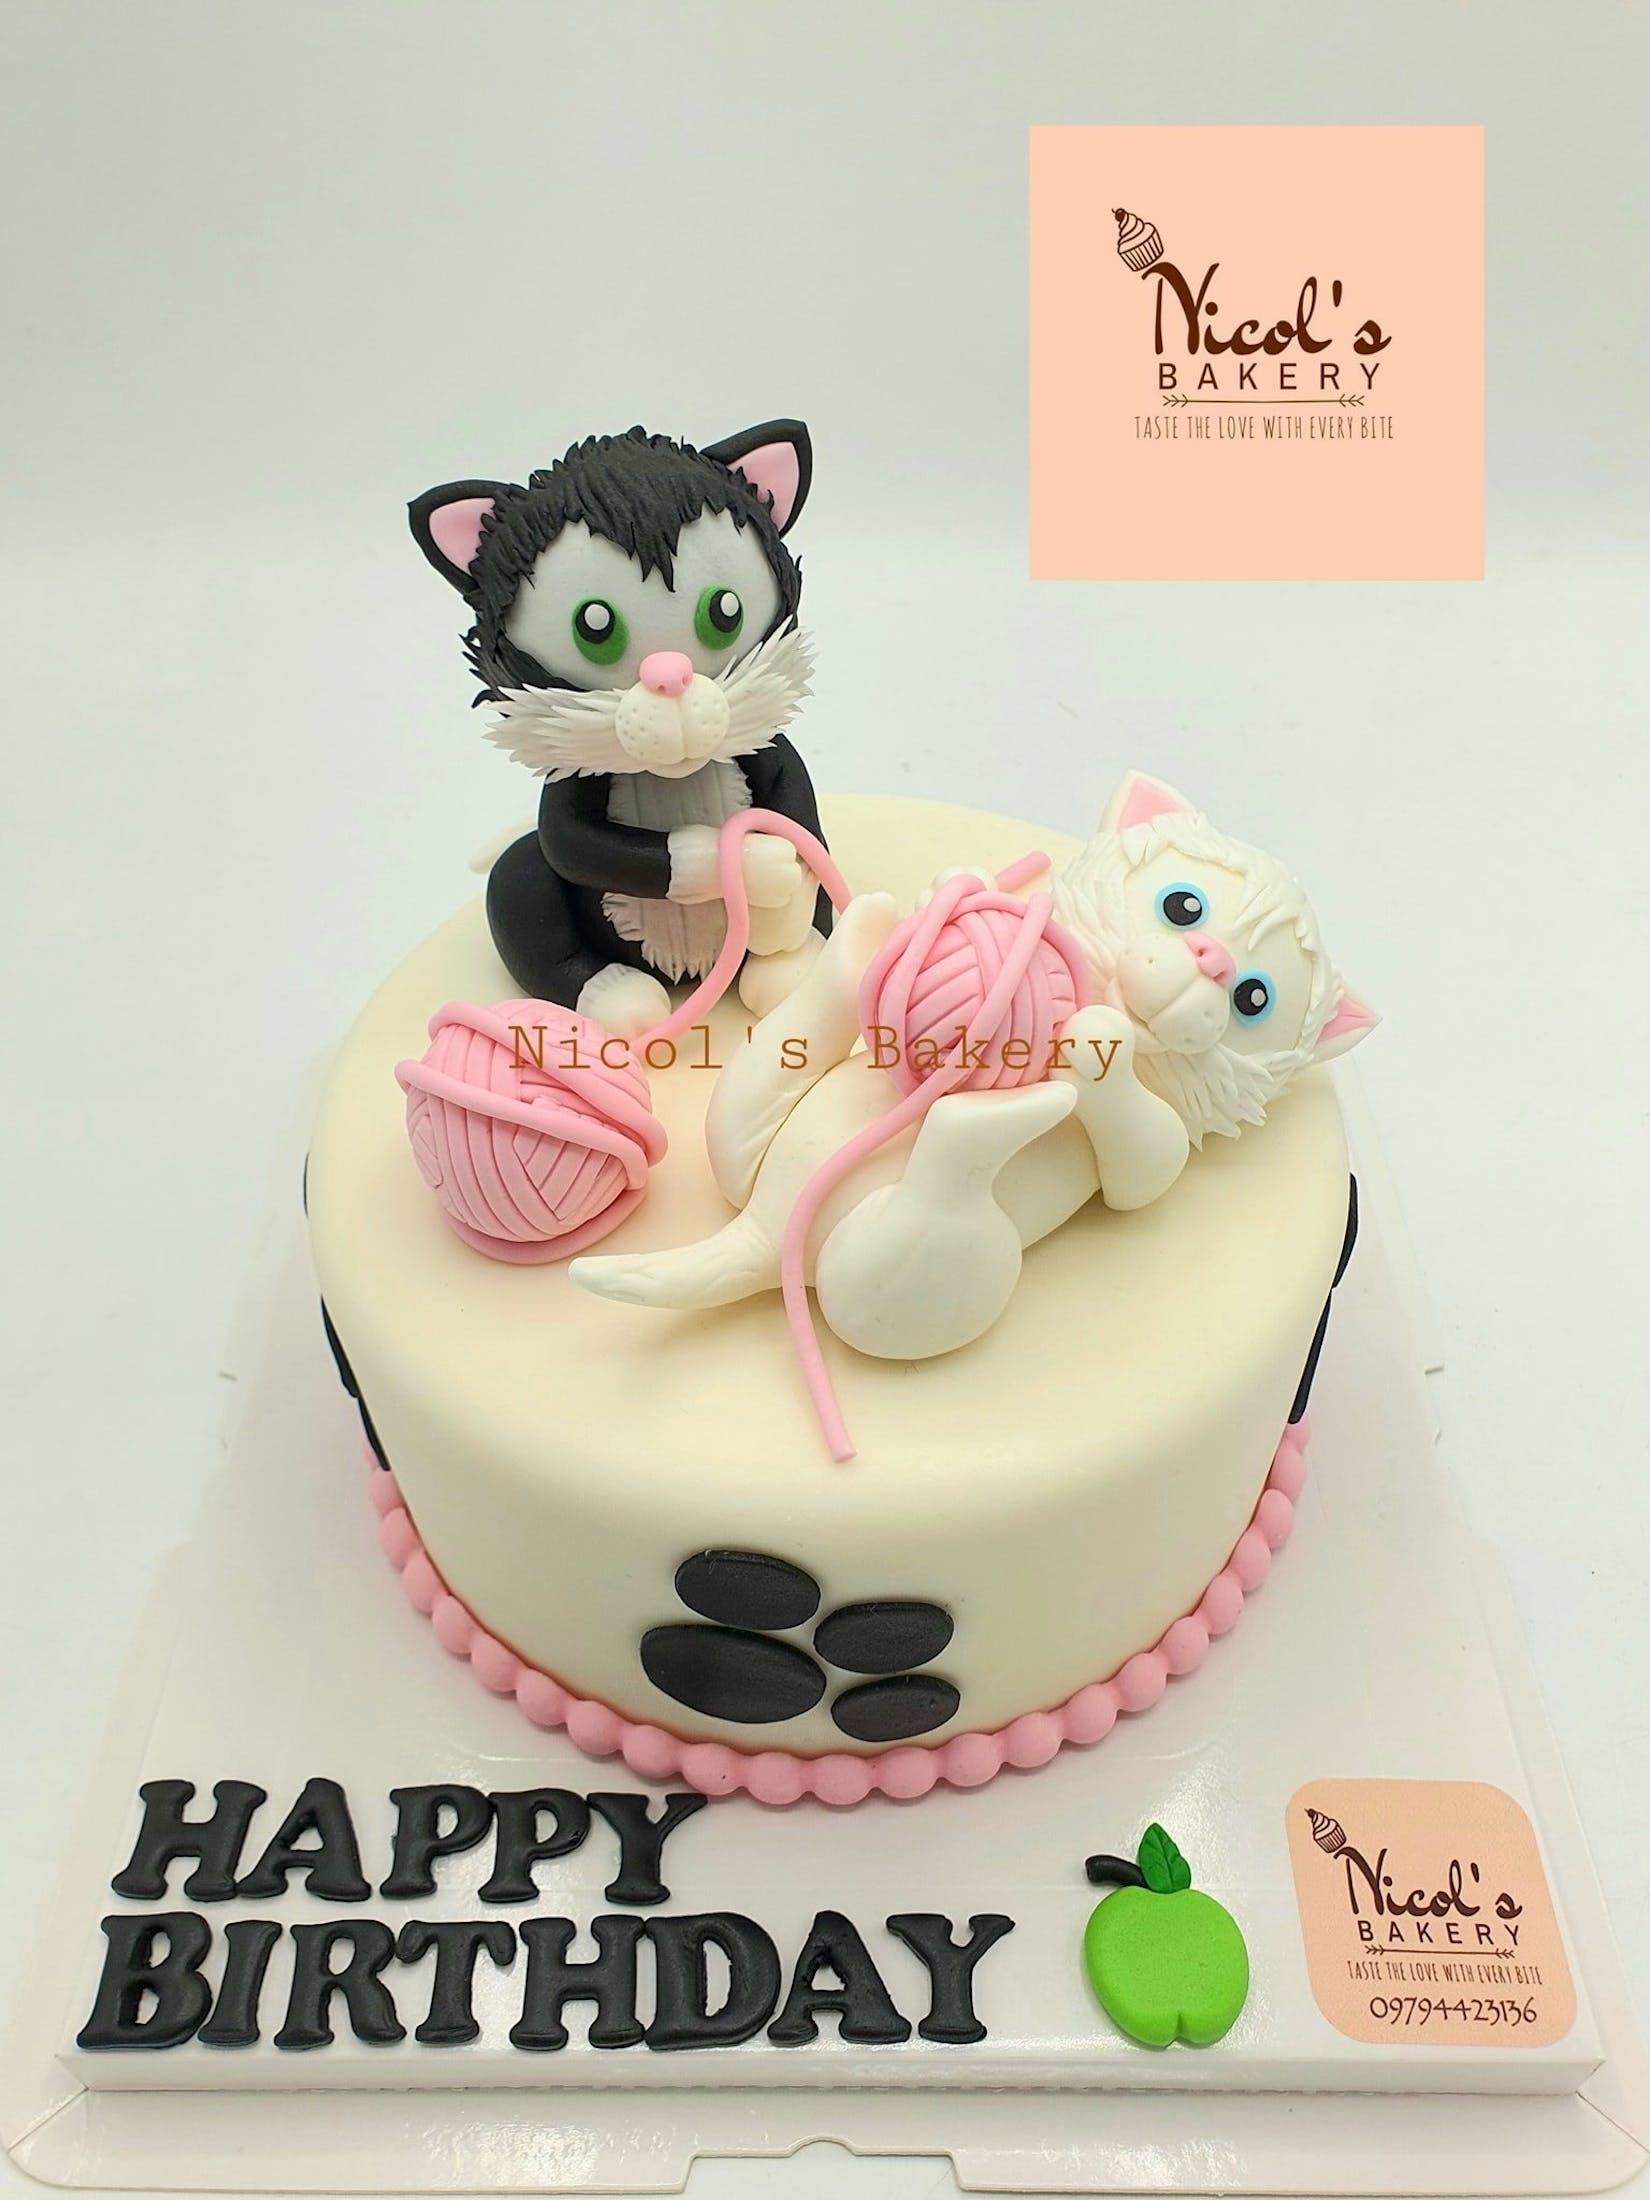 Nicol's Bakery | yathar